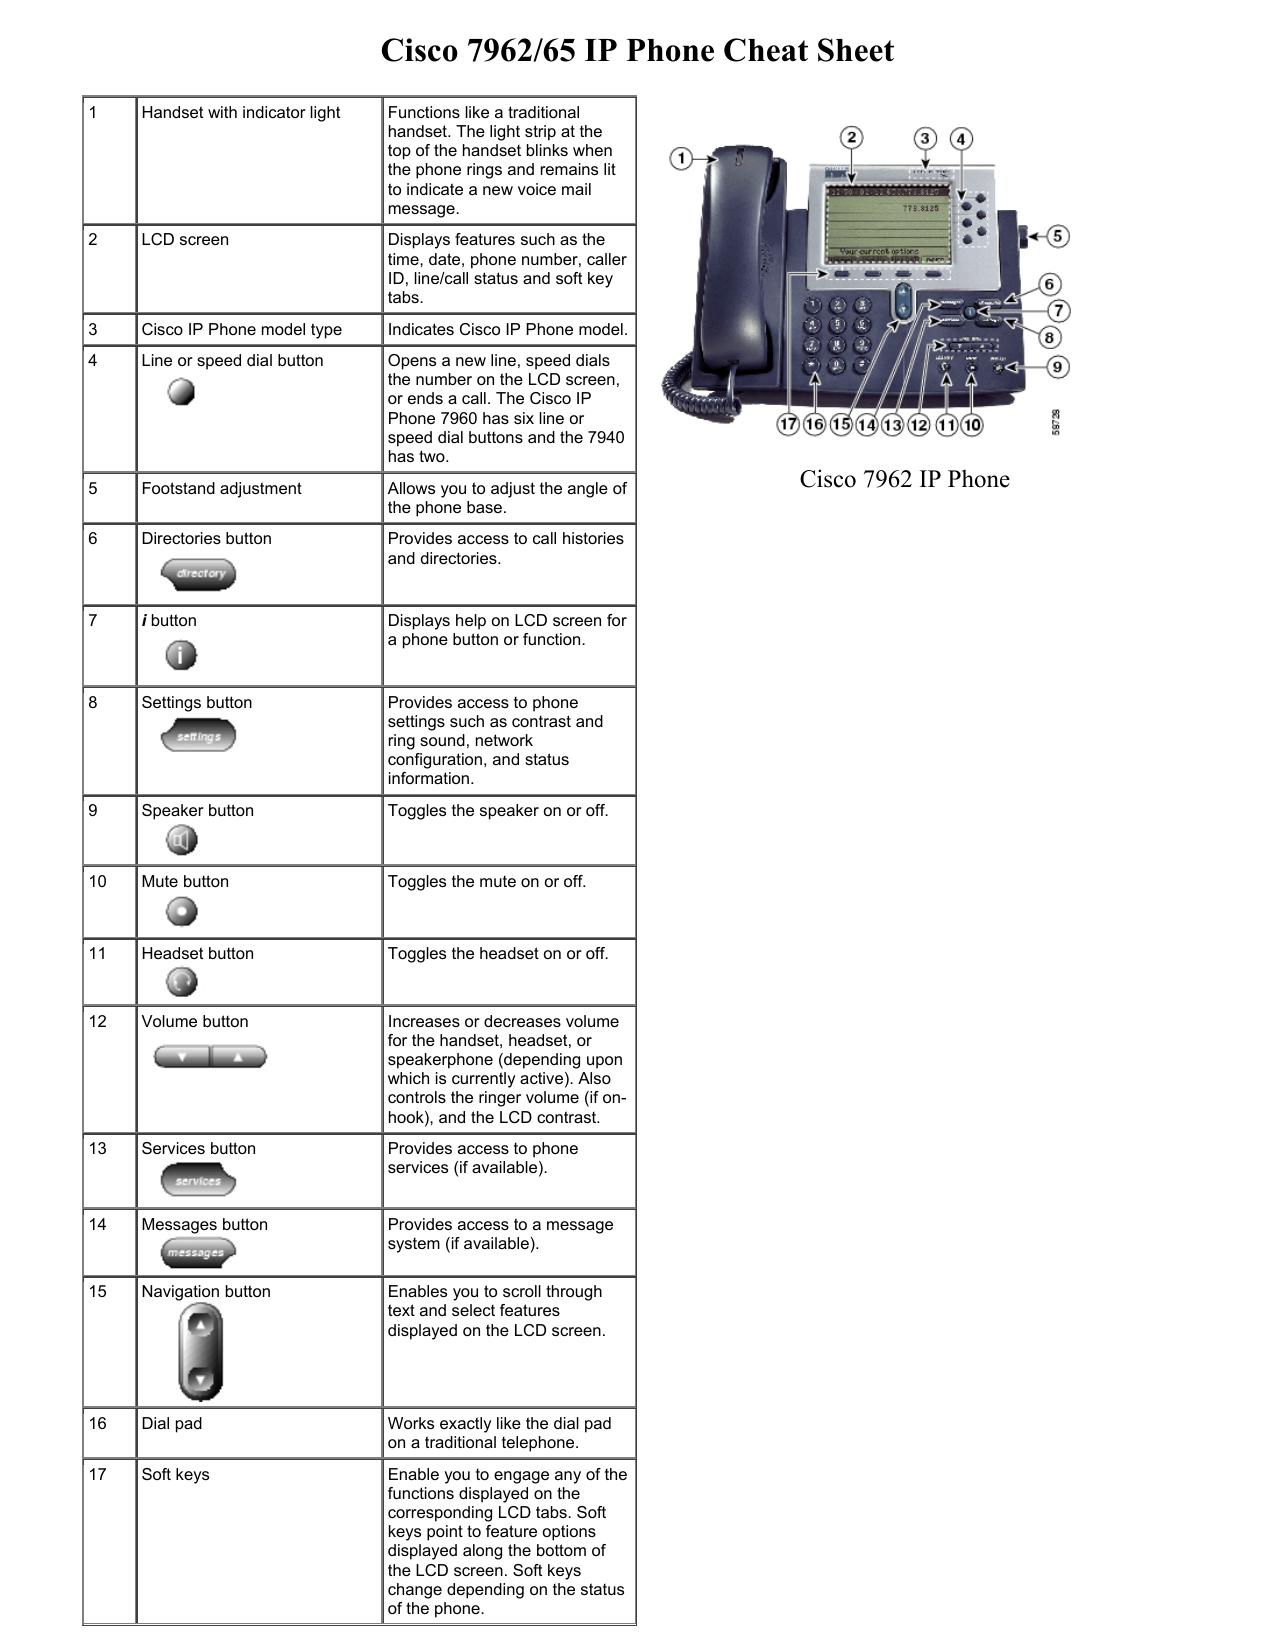 Cisco 7962/65 IP Phone Cheat Sheet | manualzz com